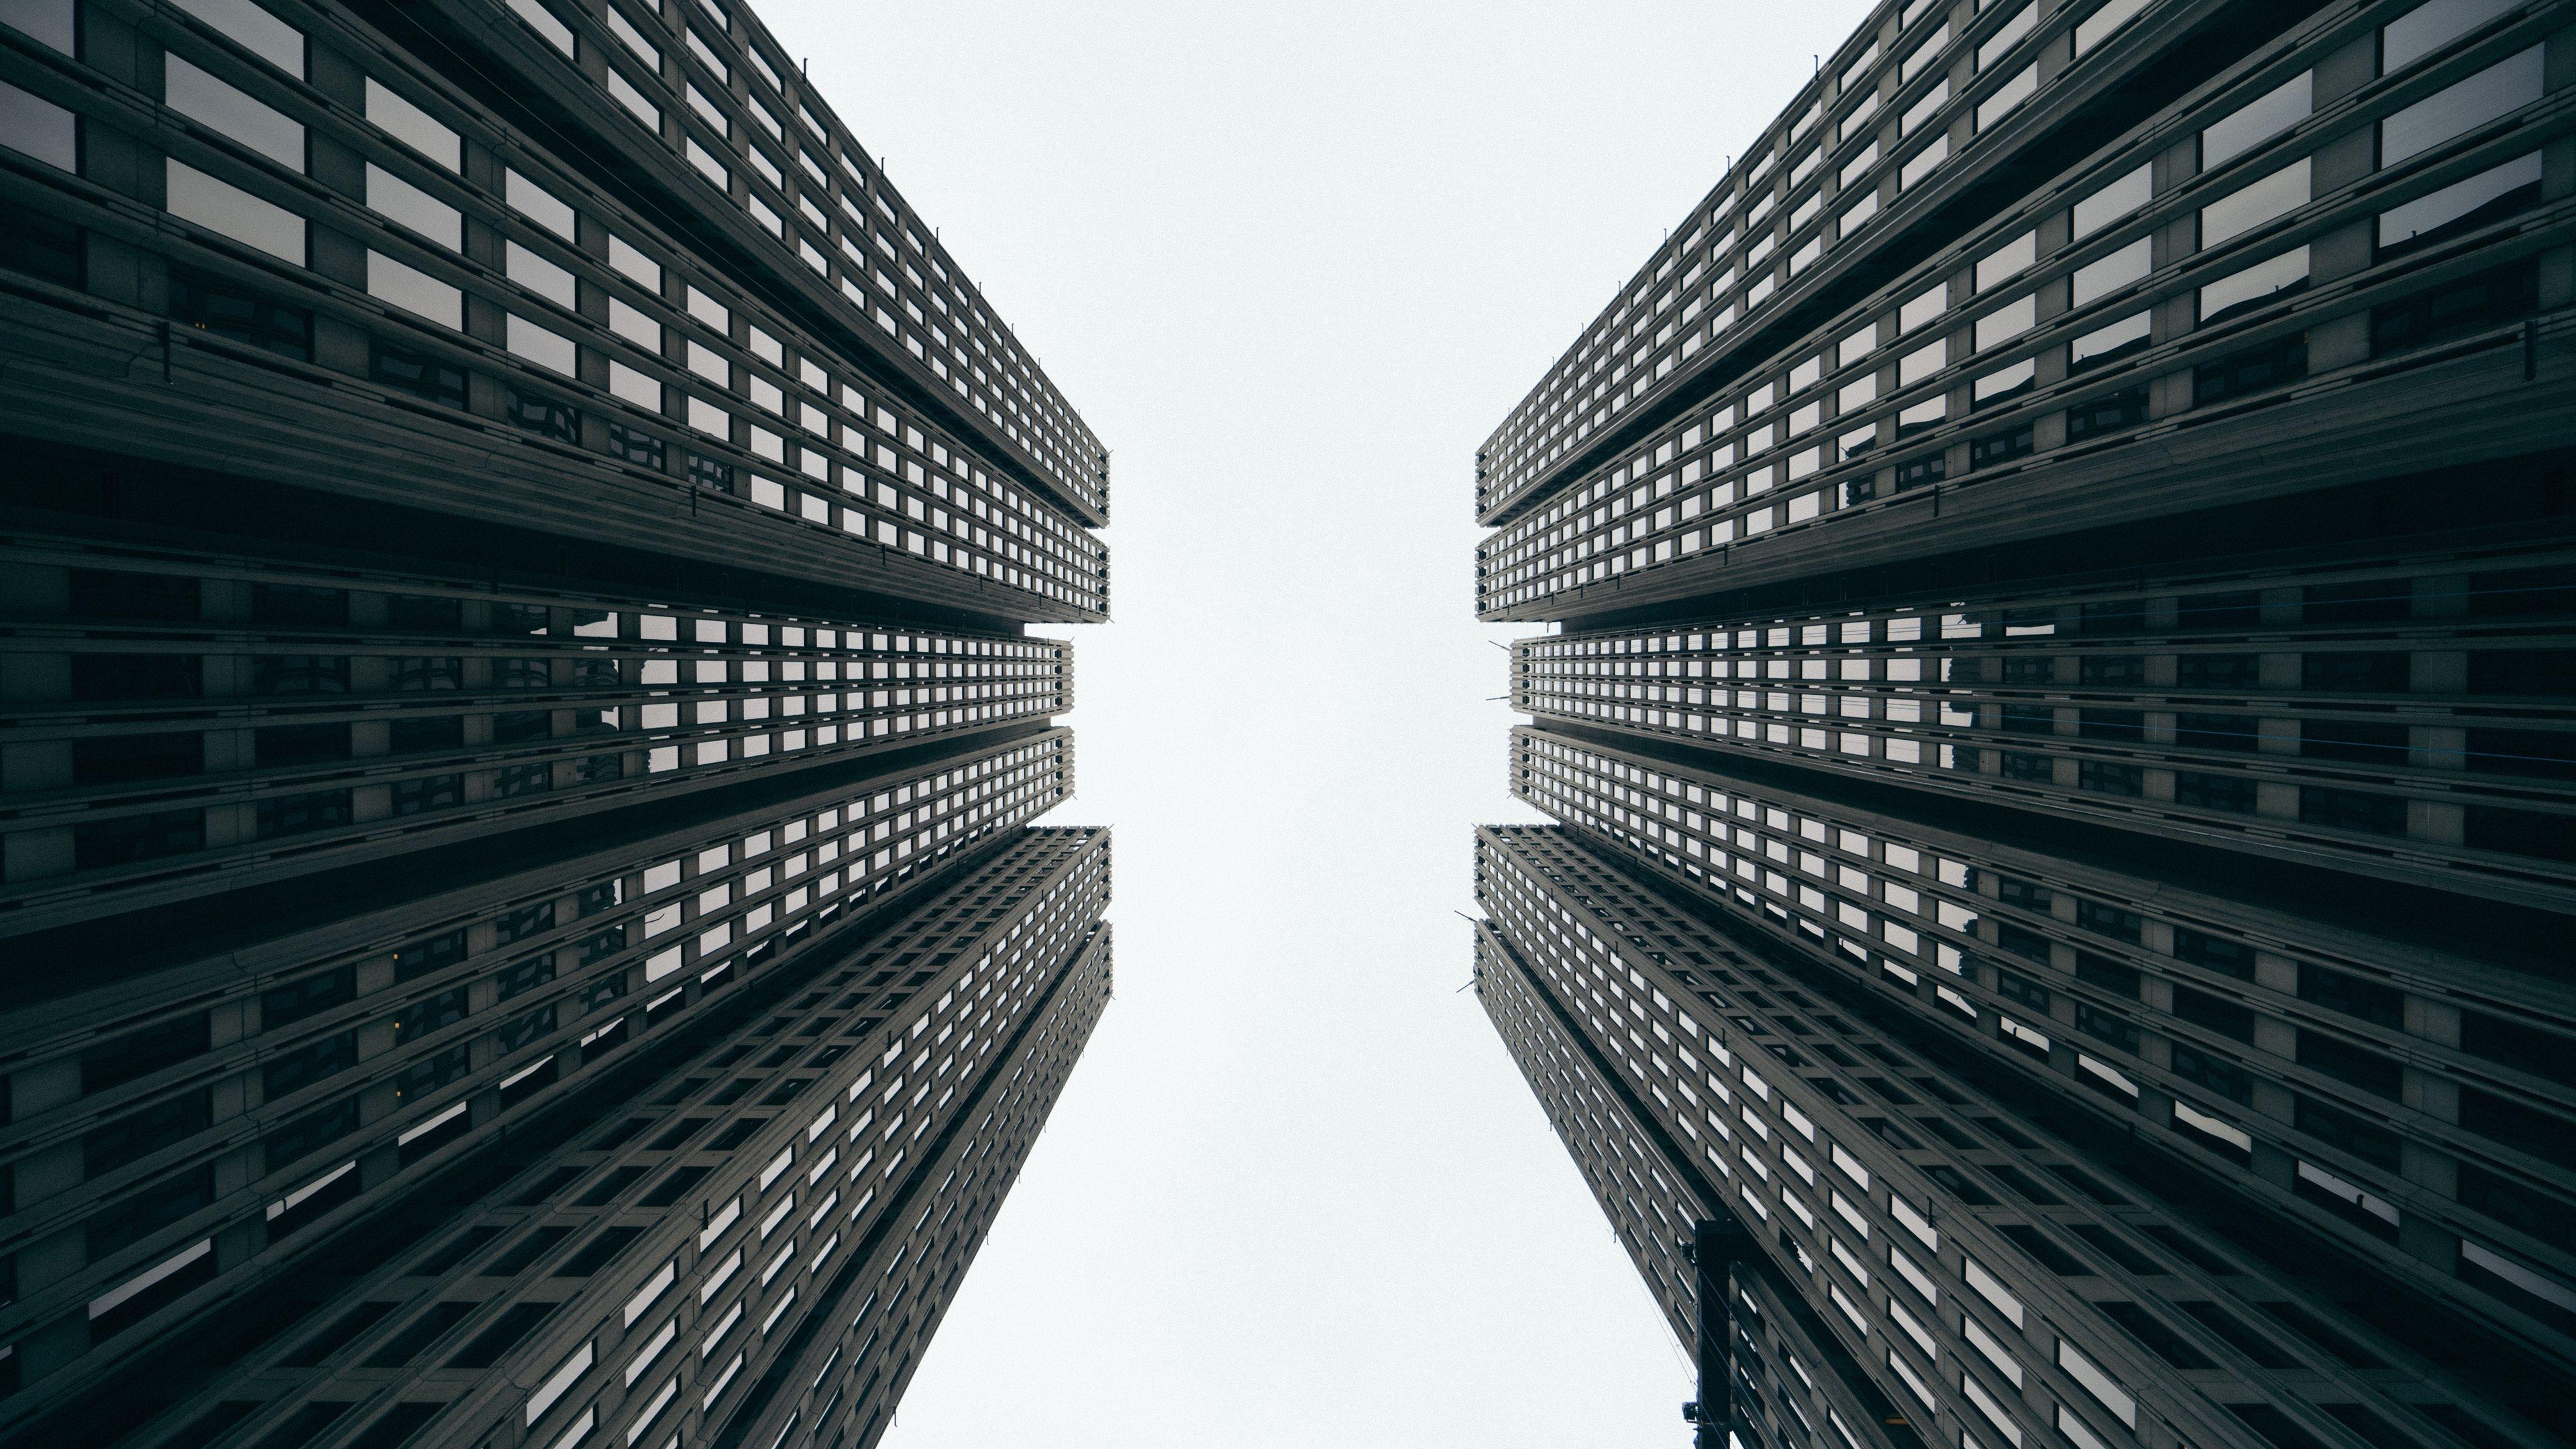 3840x2160 Wallpaper Skyscrapers Buildings Bottom View